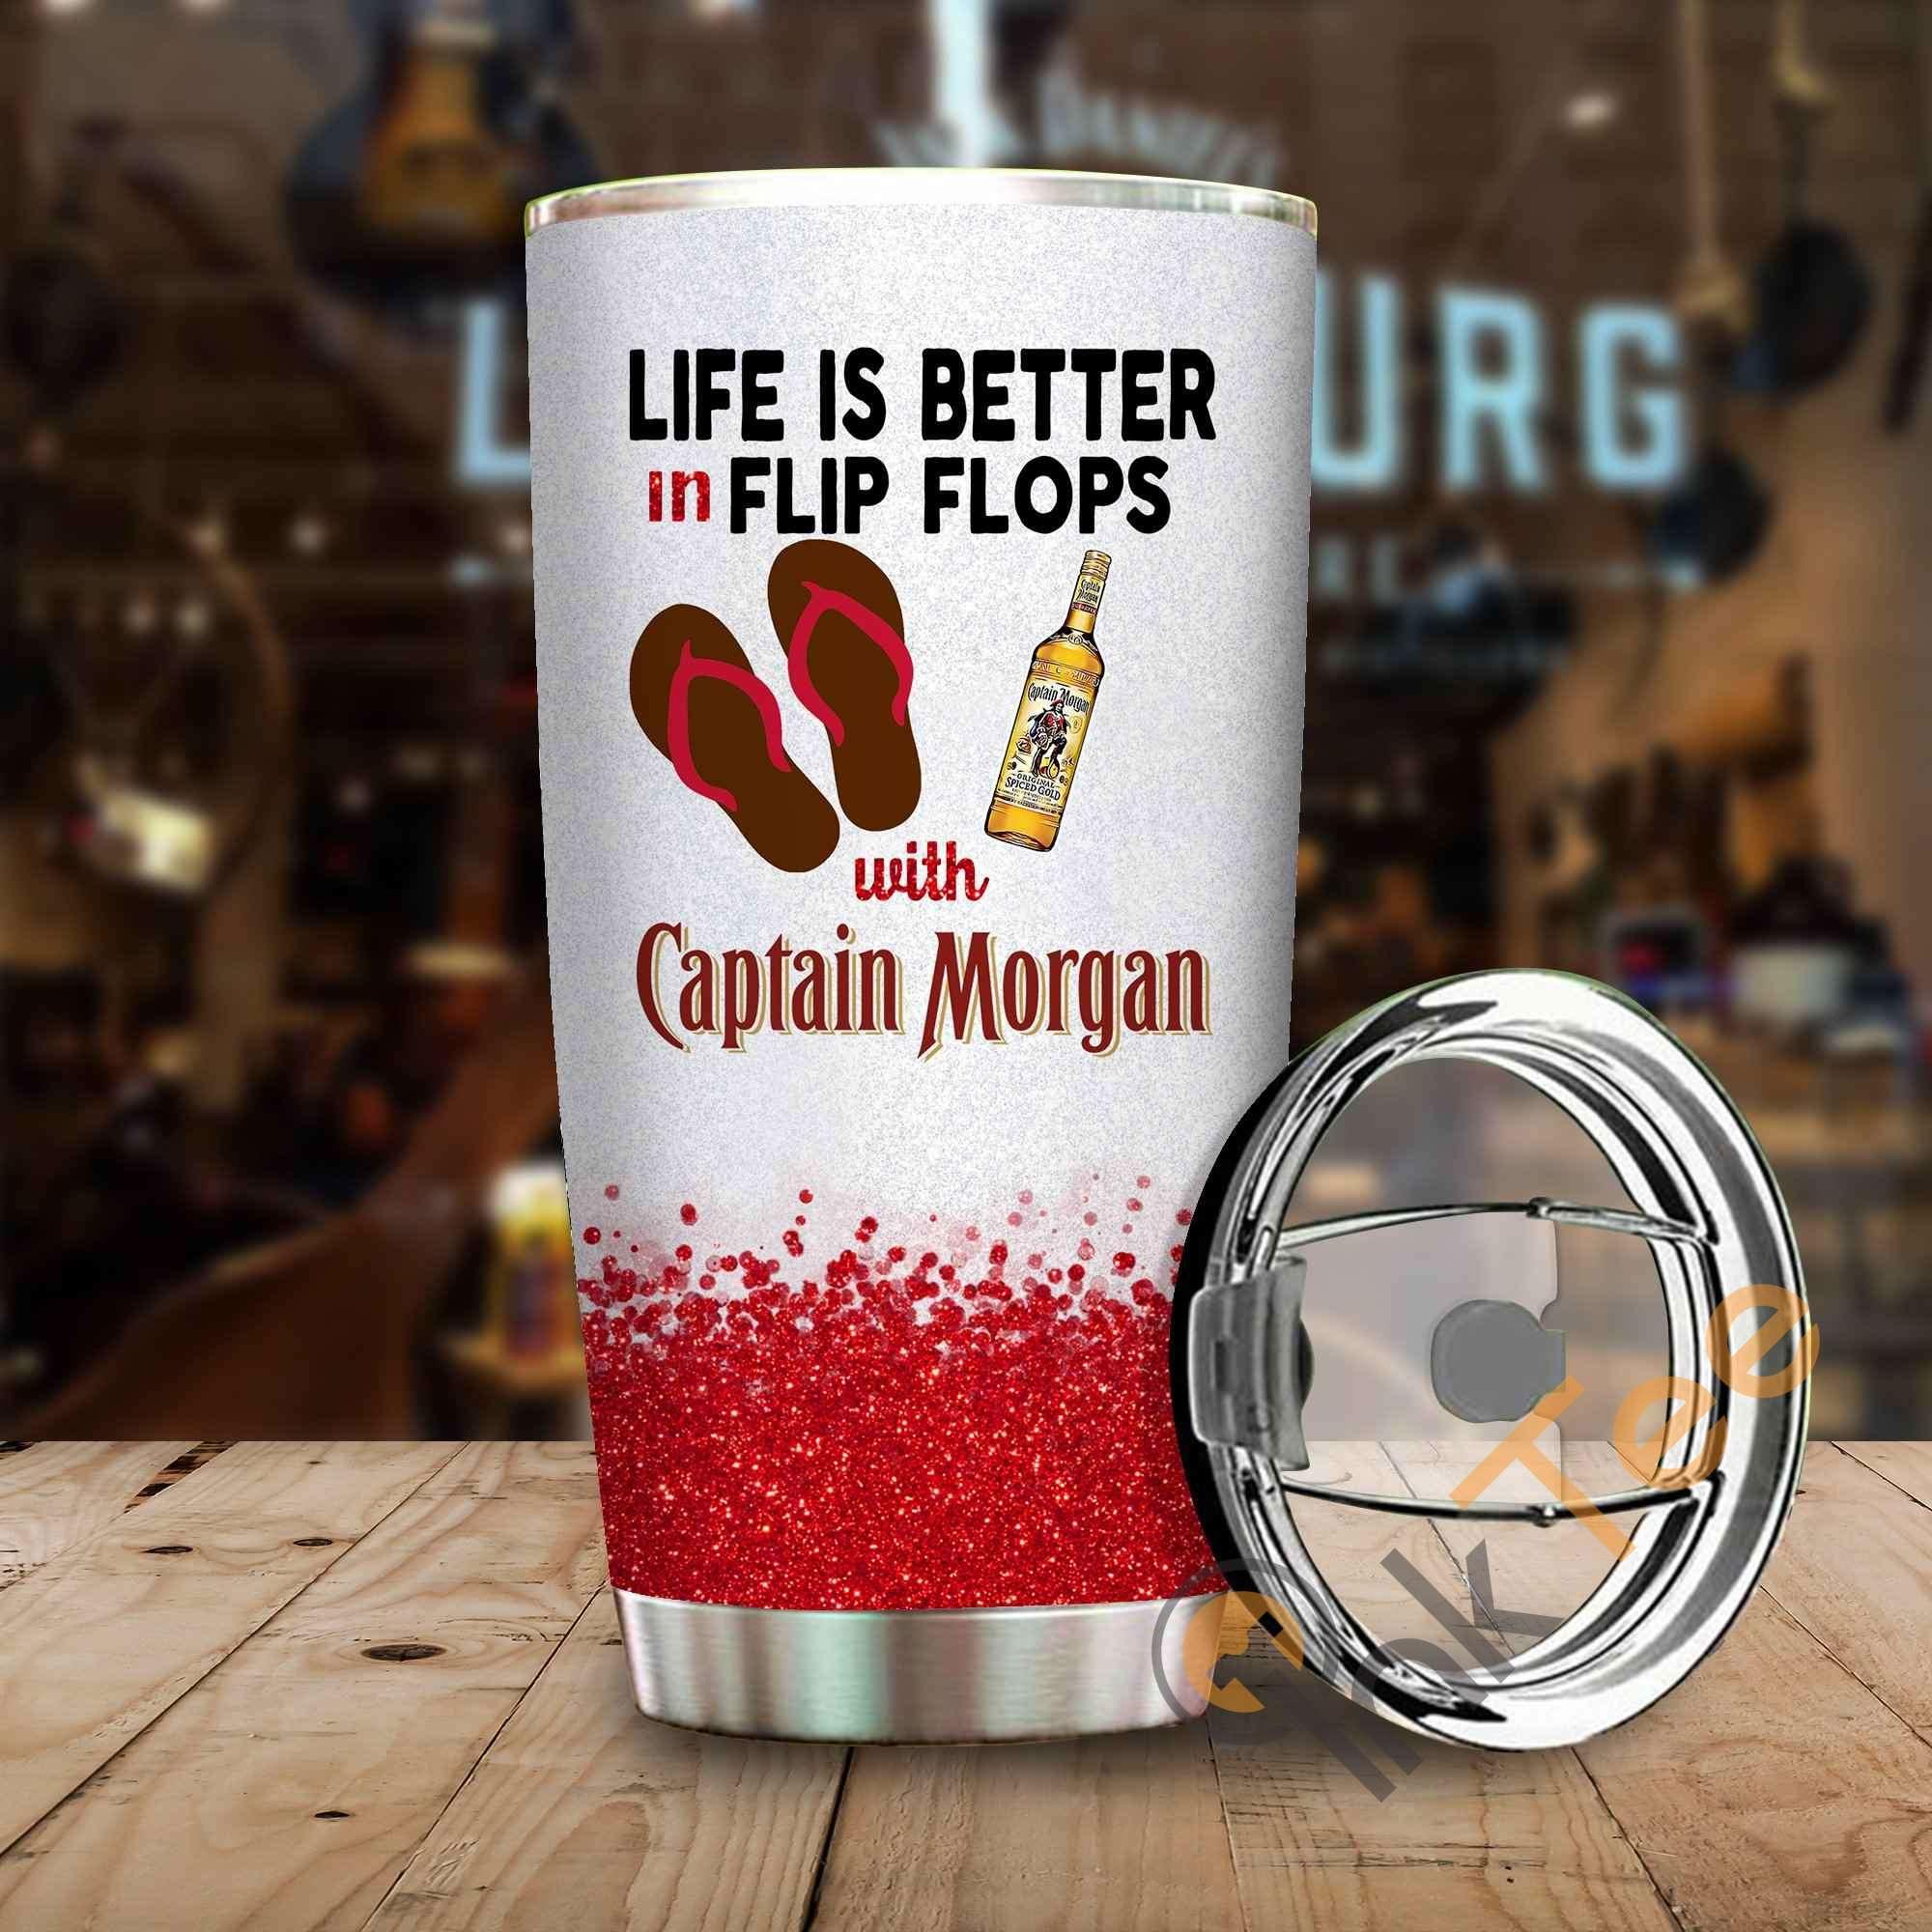 Life Is Better In Flip Flops With Captain Morgan Amazon Best Seller Sku 3900 Stainless Steel Tumbler